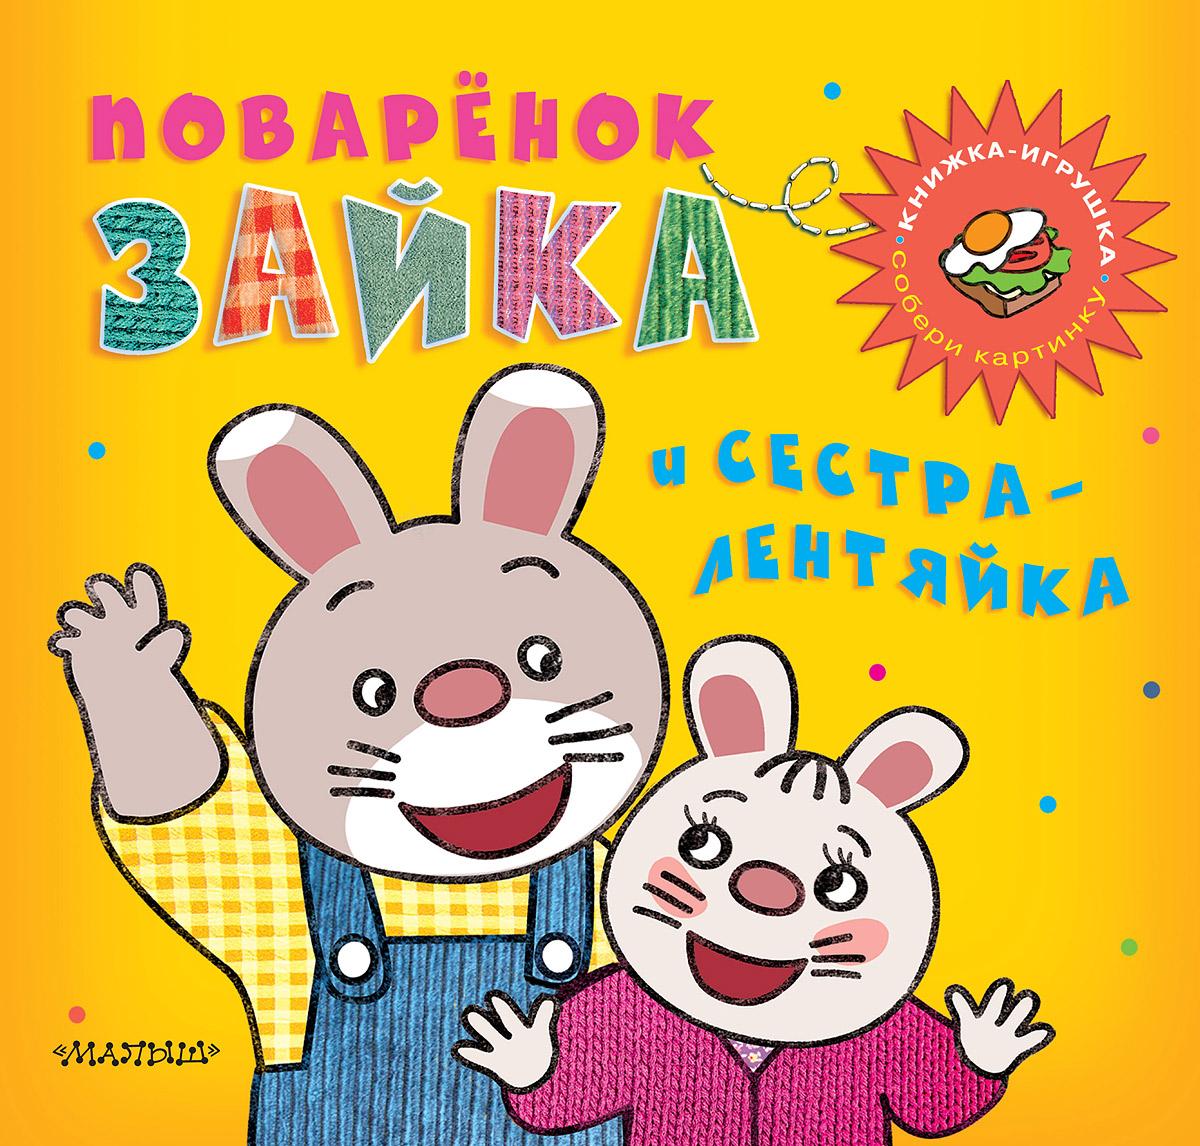 М. Парнякова Поваренок Зайка и сестра-лентяйка. Книжка-игрушка